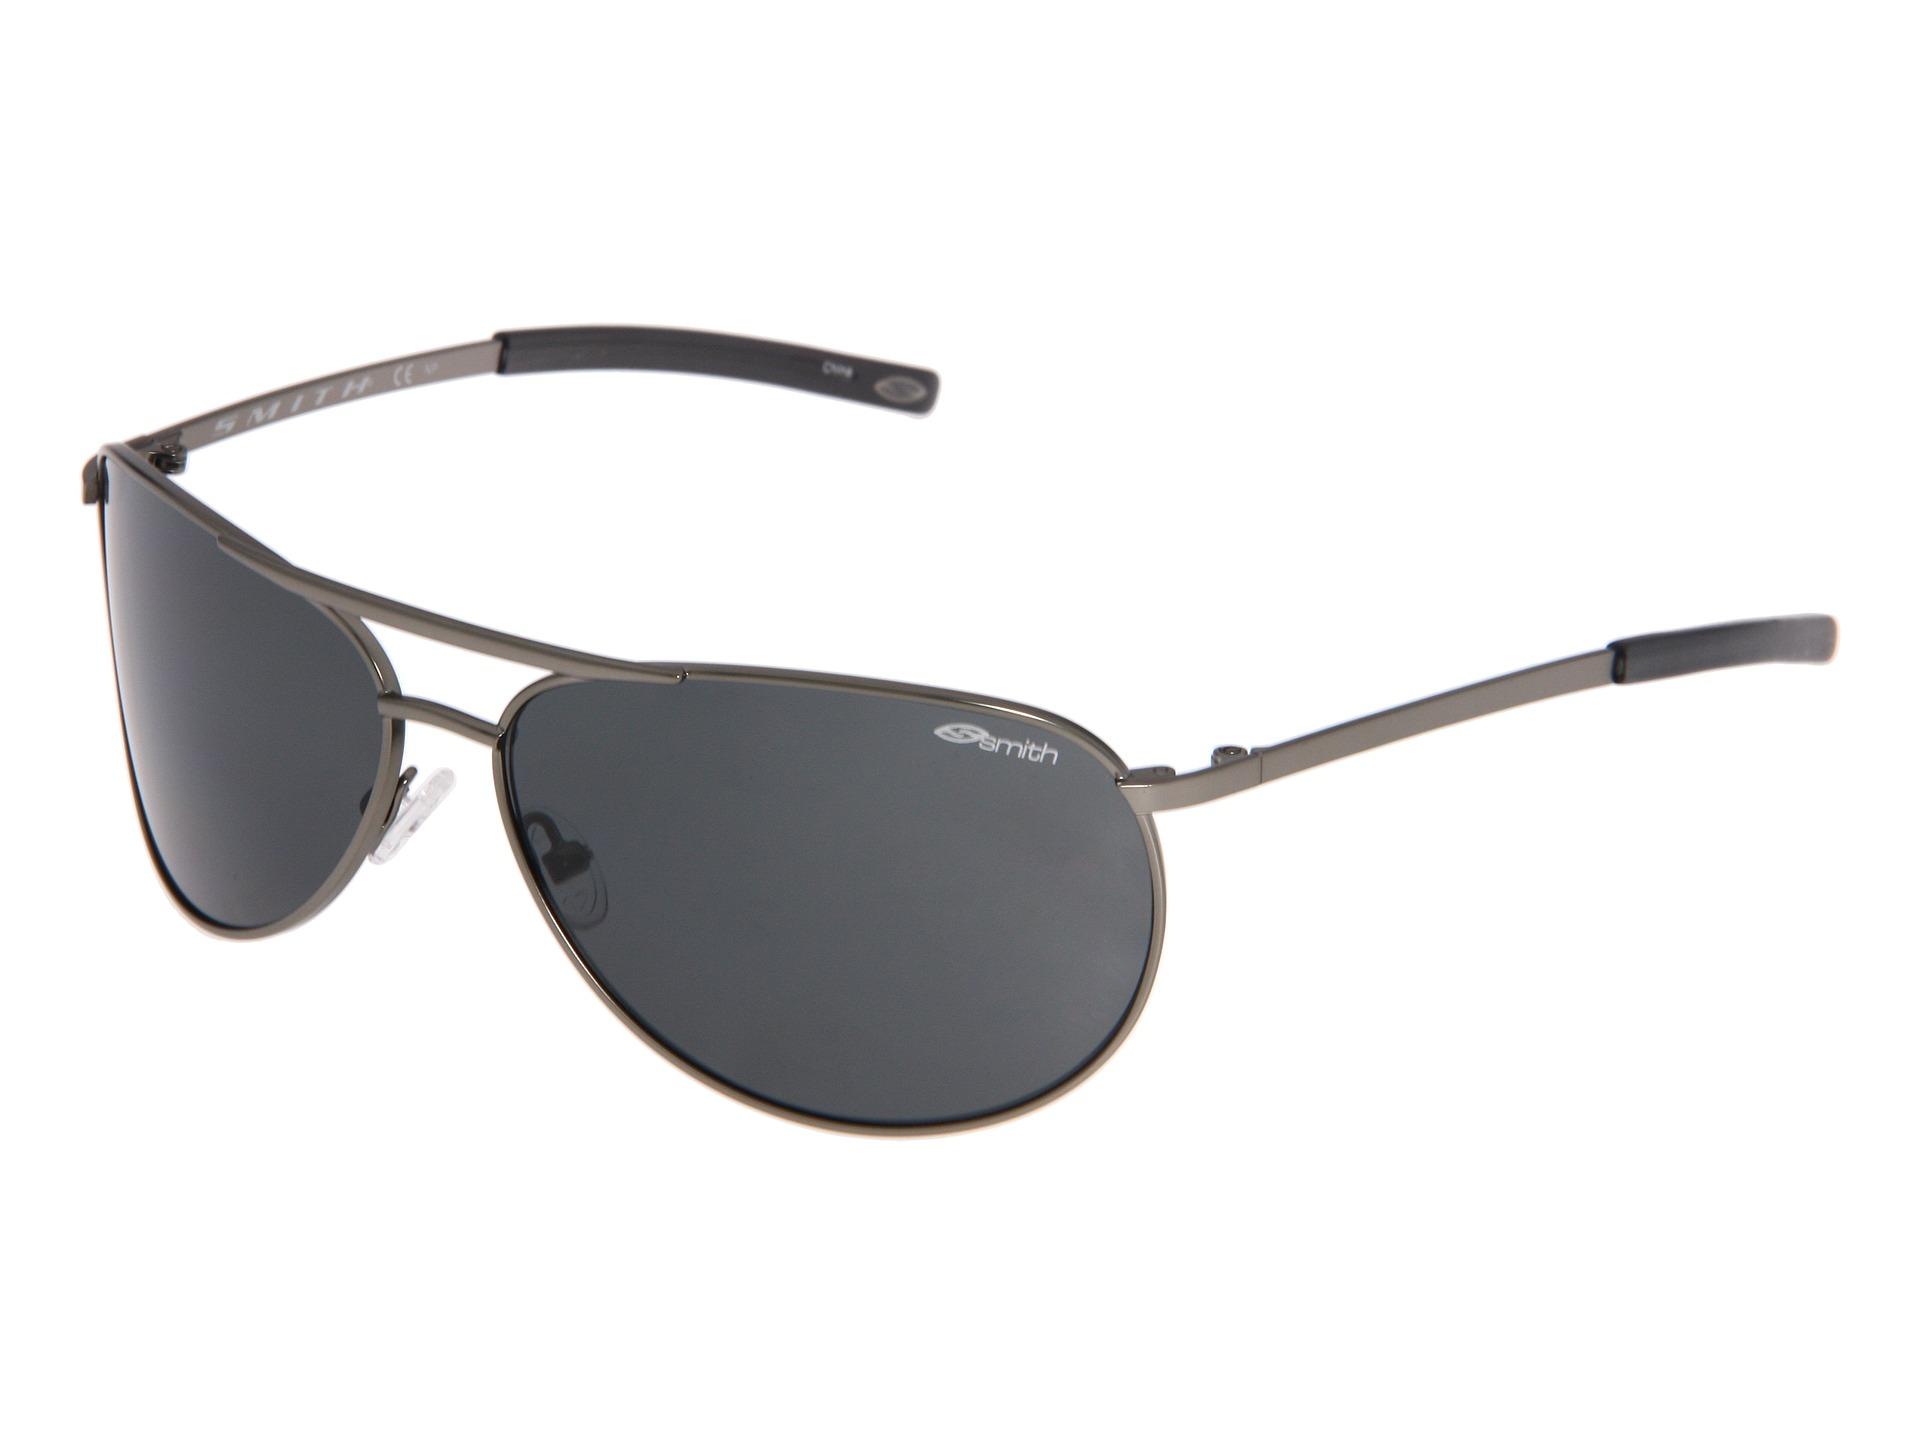 d5435c0d8a Smith Serpico Slim Polarized Sunglasses « Heritage Malta